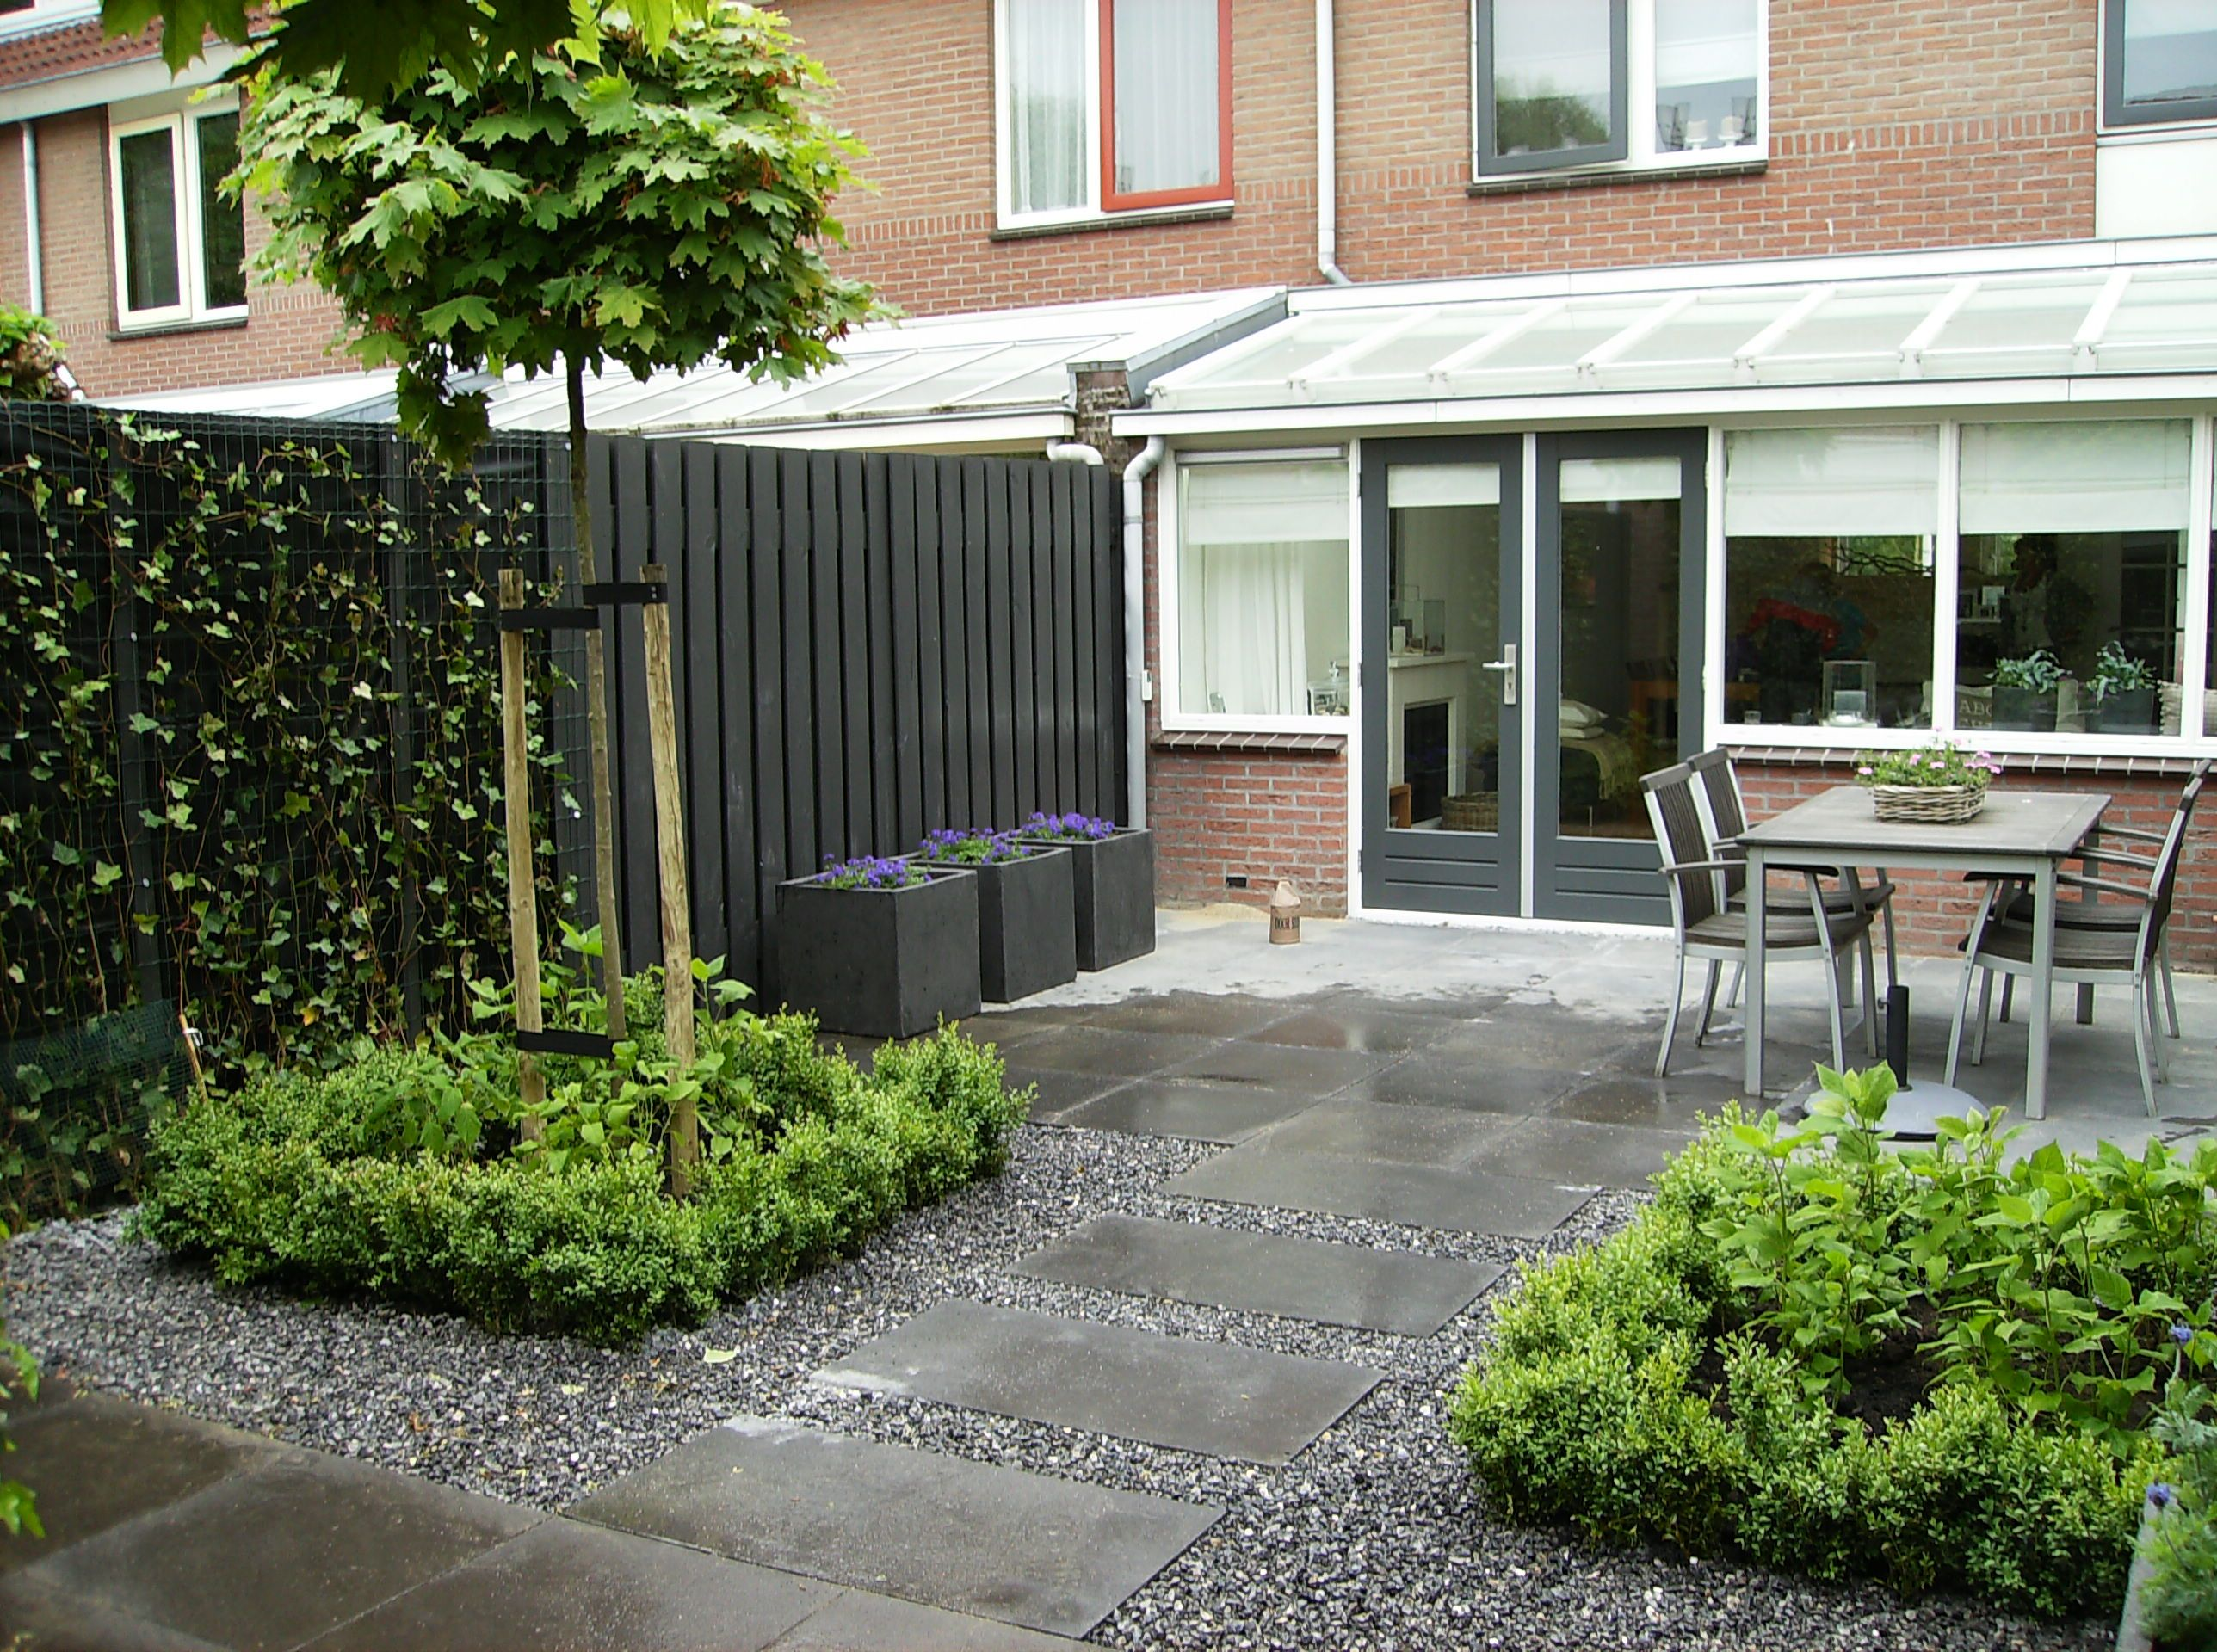 Voorbeeld tuinontwerp kleine tuin google zoeken tuin for Moderne kleine tuin